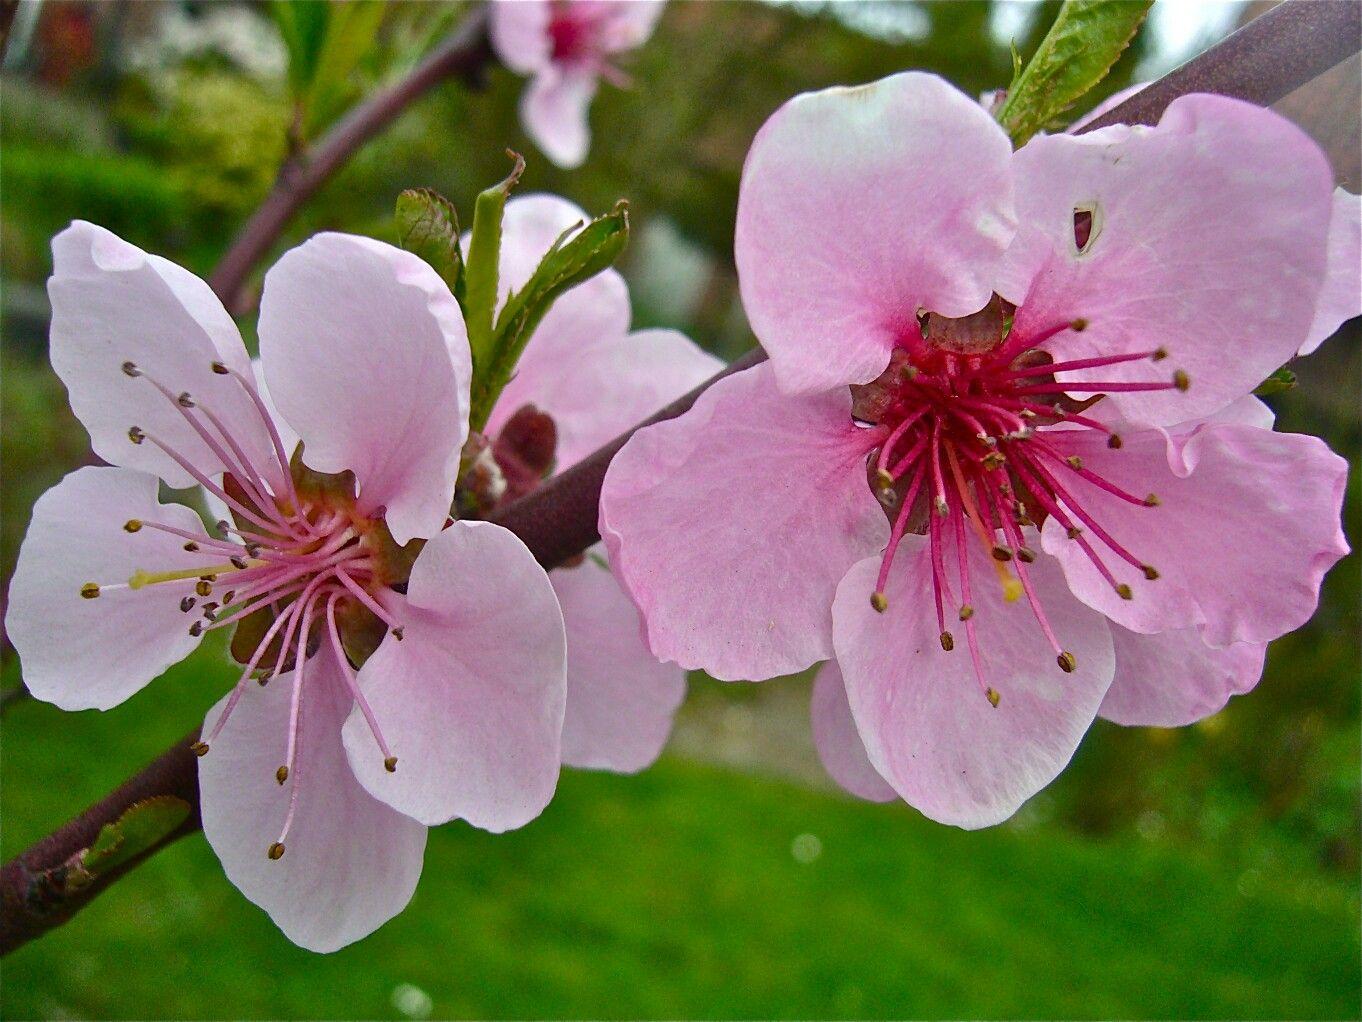 Peach Blossom Delaware State Flower Peach blossoms